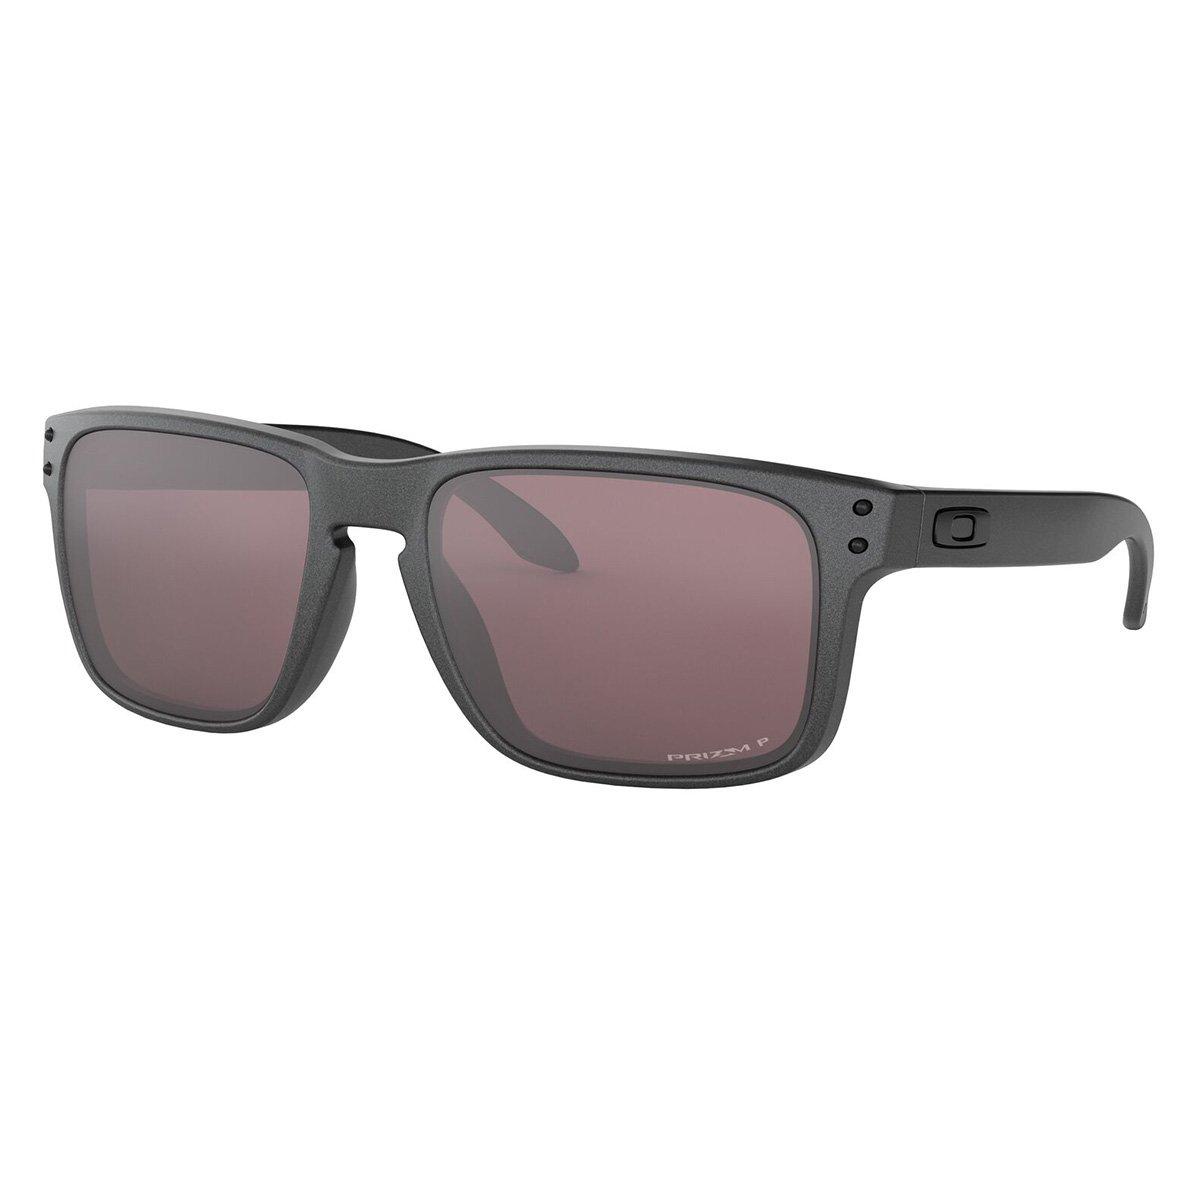 6d822aa5c3843 Óculos Oakley Holbrook - Preto e Cinza - Compre Agora   Netshoes